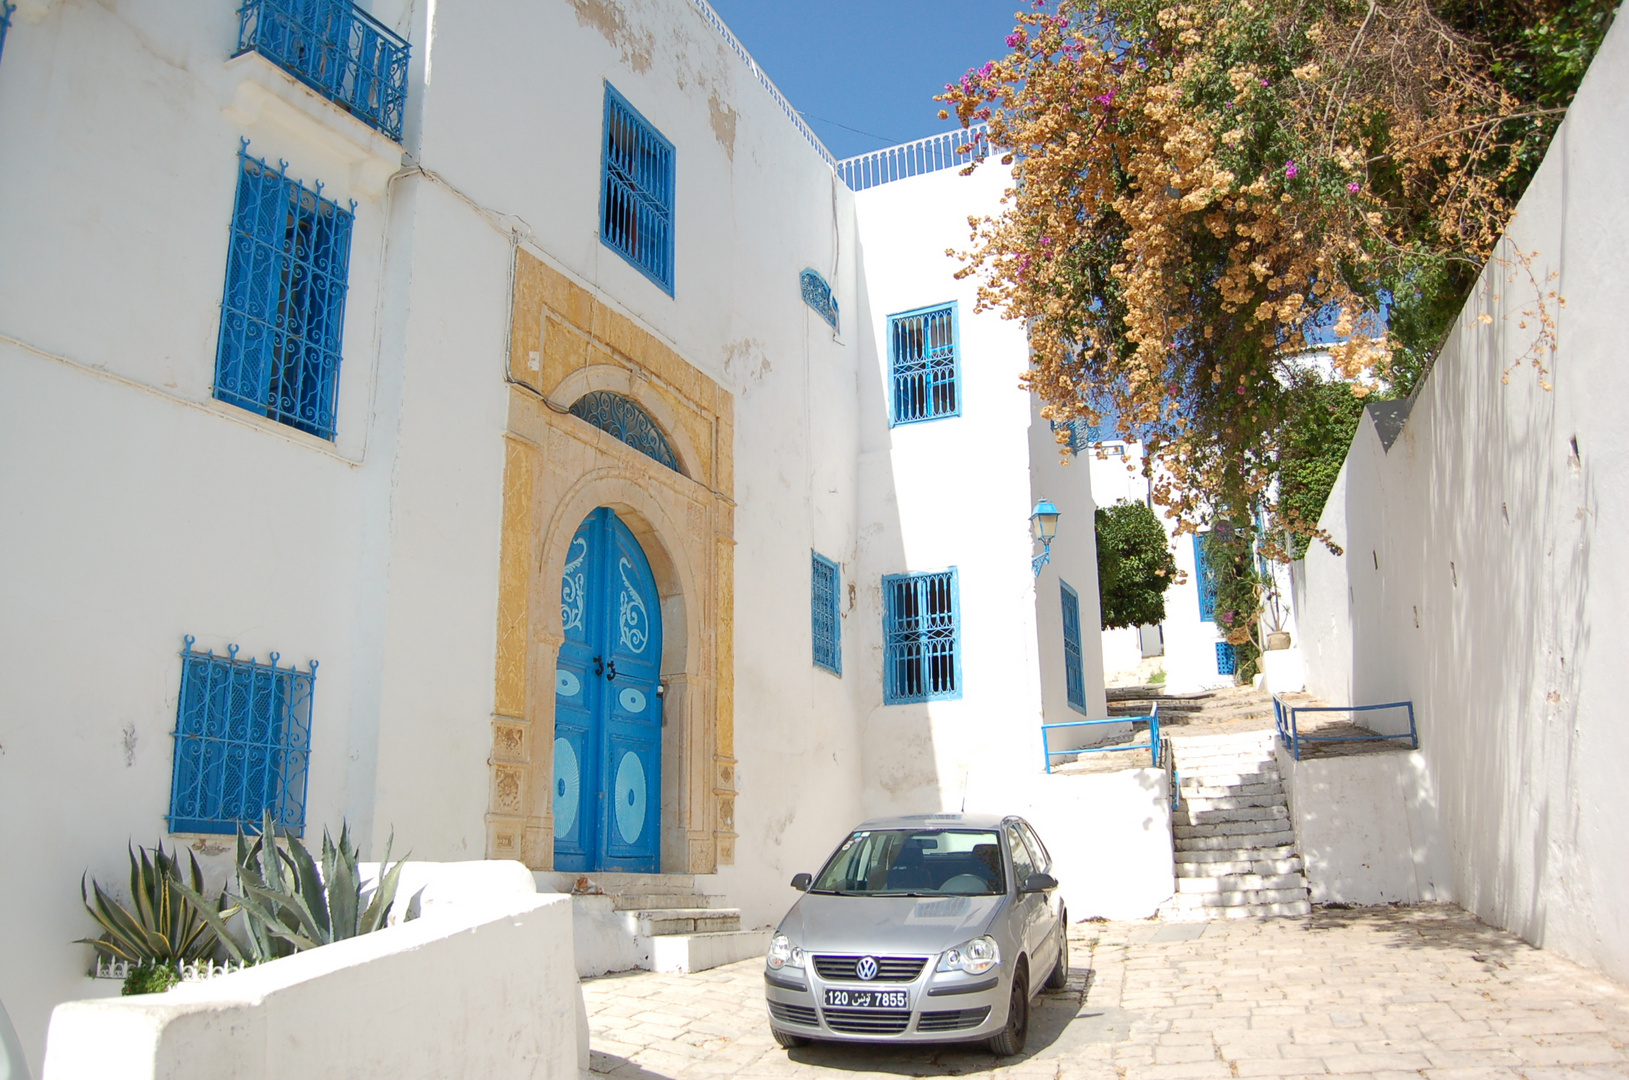 VW in Sidi Bou Saïd (Tunesien)